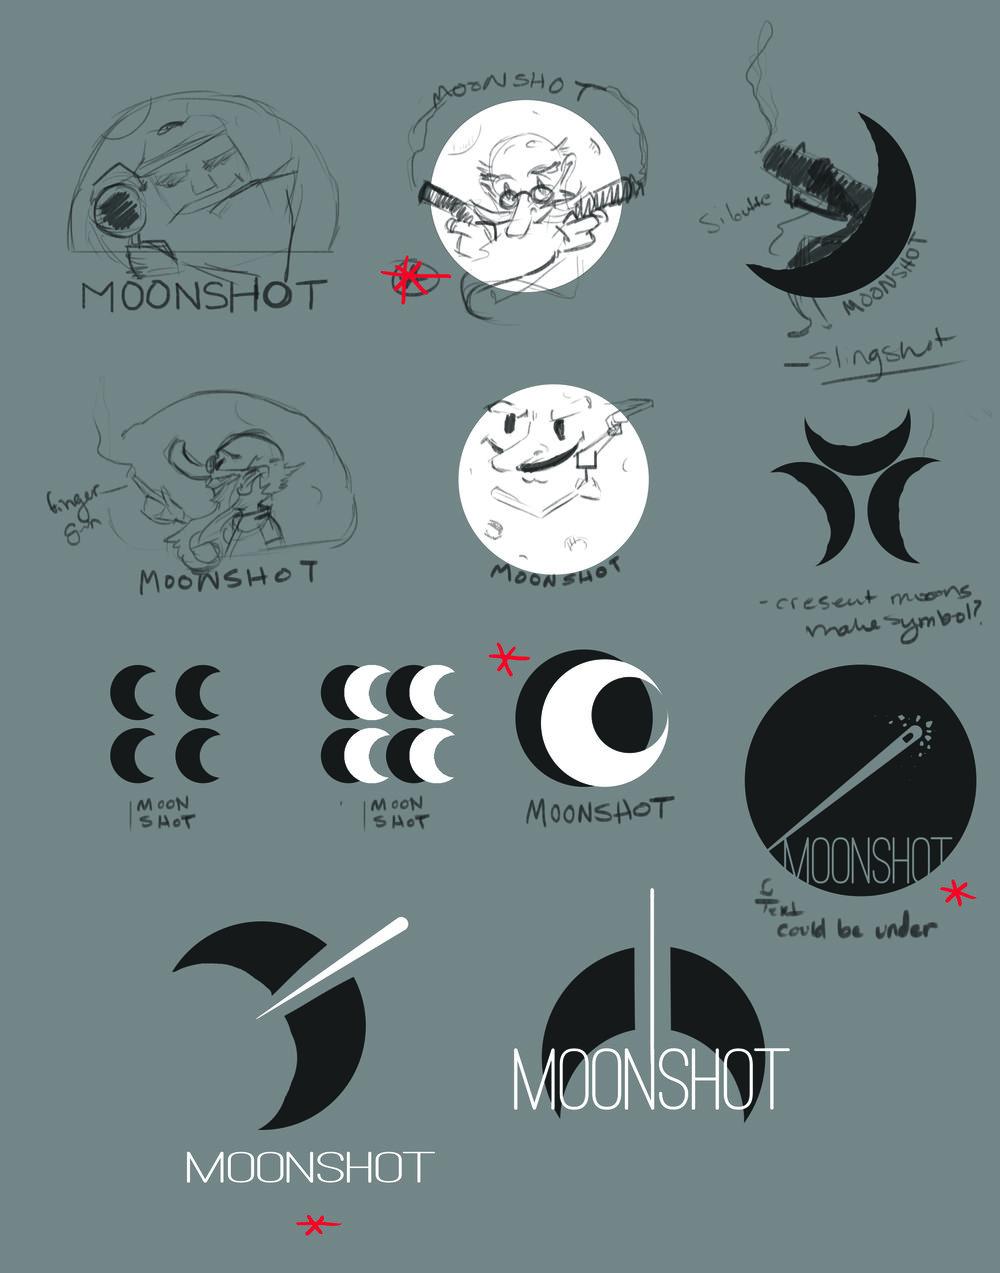 moonshotlogo1.jpg